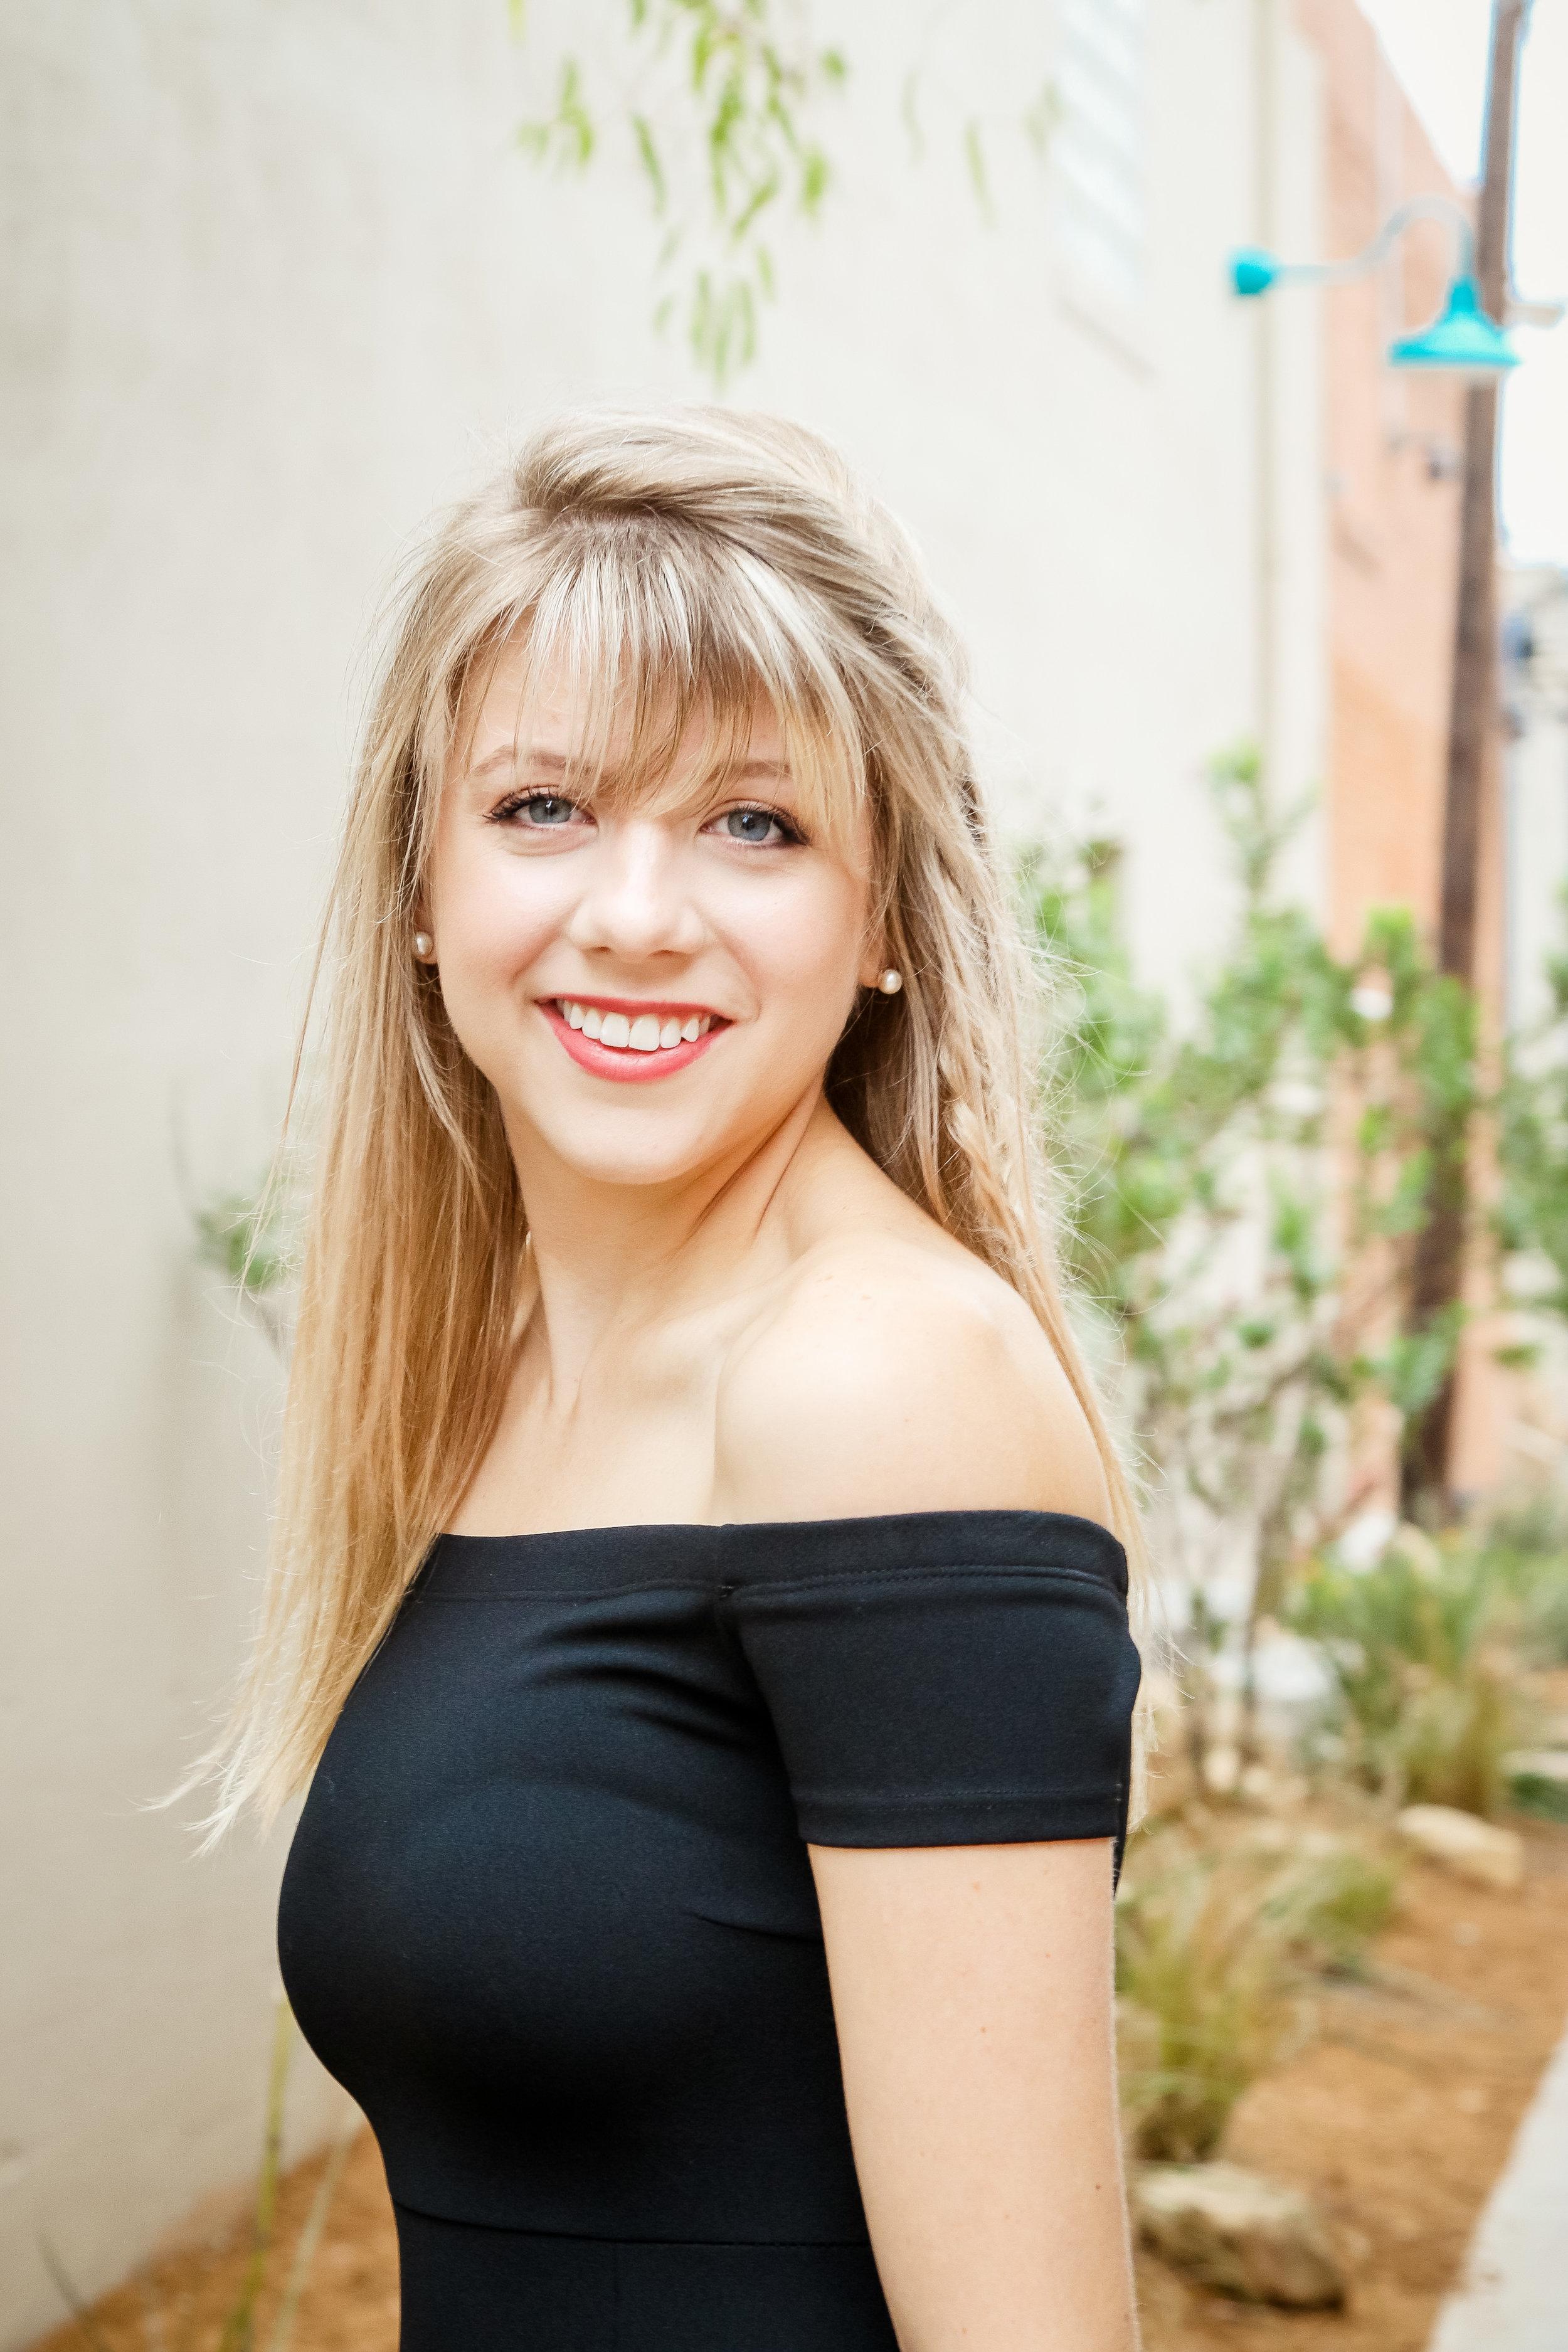 Houston Fashion Blogger - Wander Dust - Little Black Dress - Shop PinkBlush (1).jpg